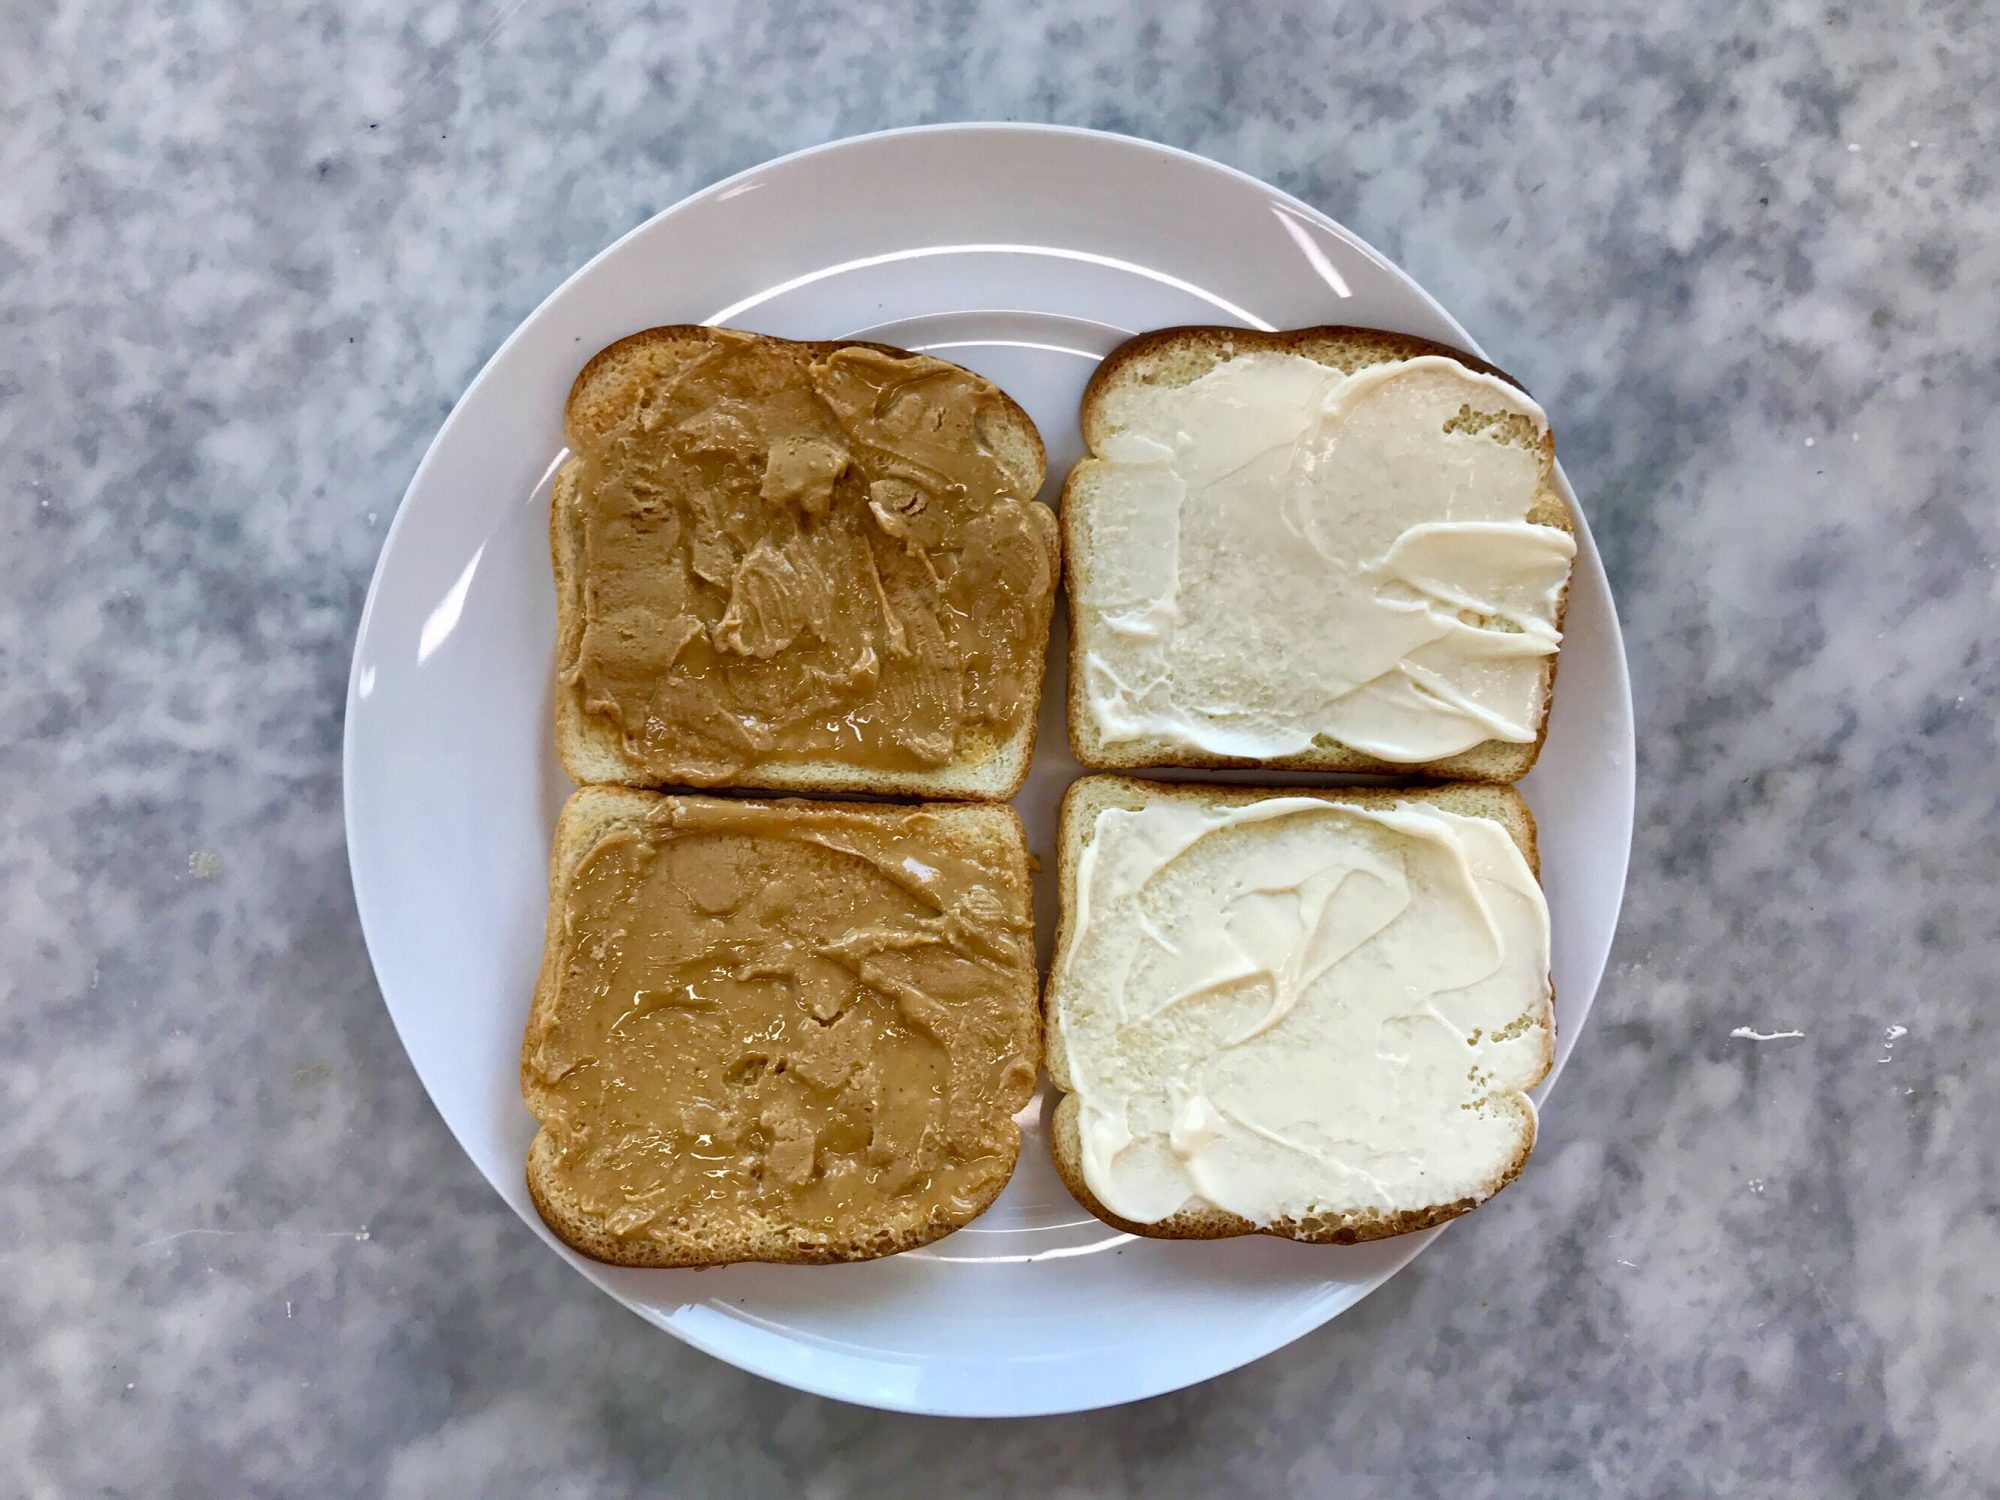 peanut butter and mayonnaise open sandwich